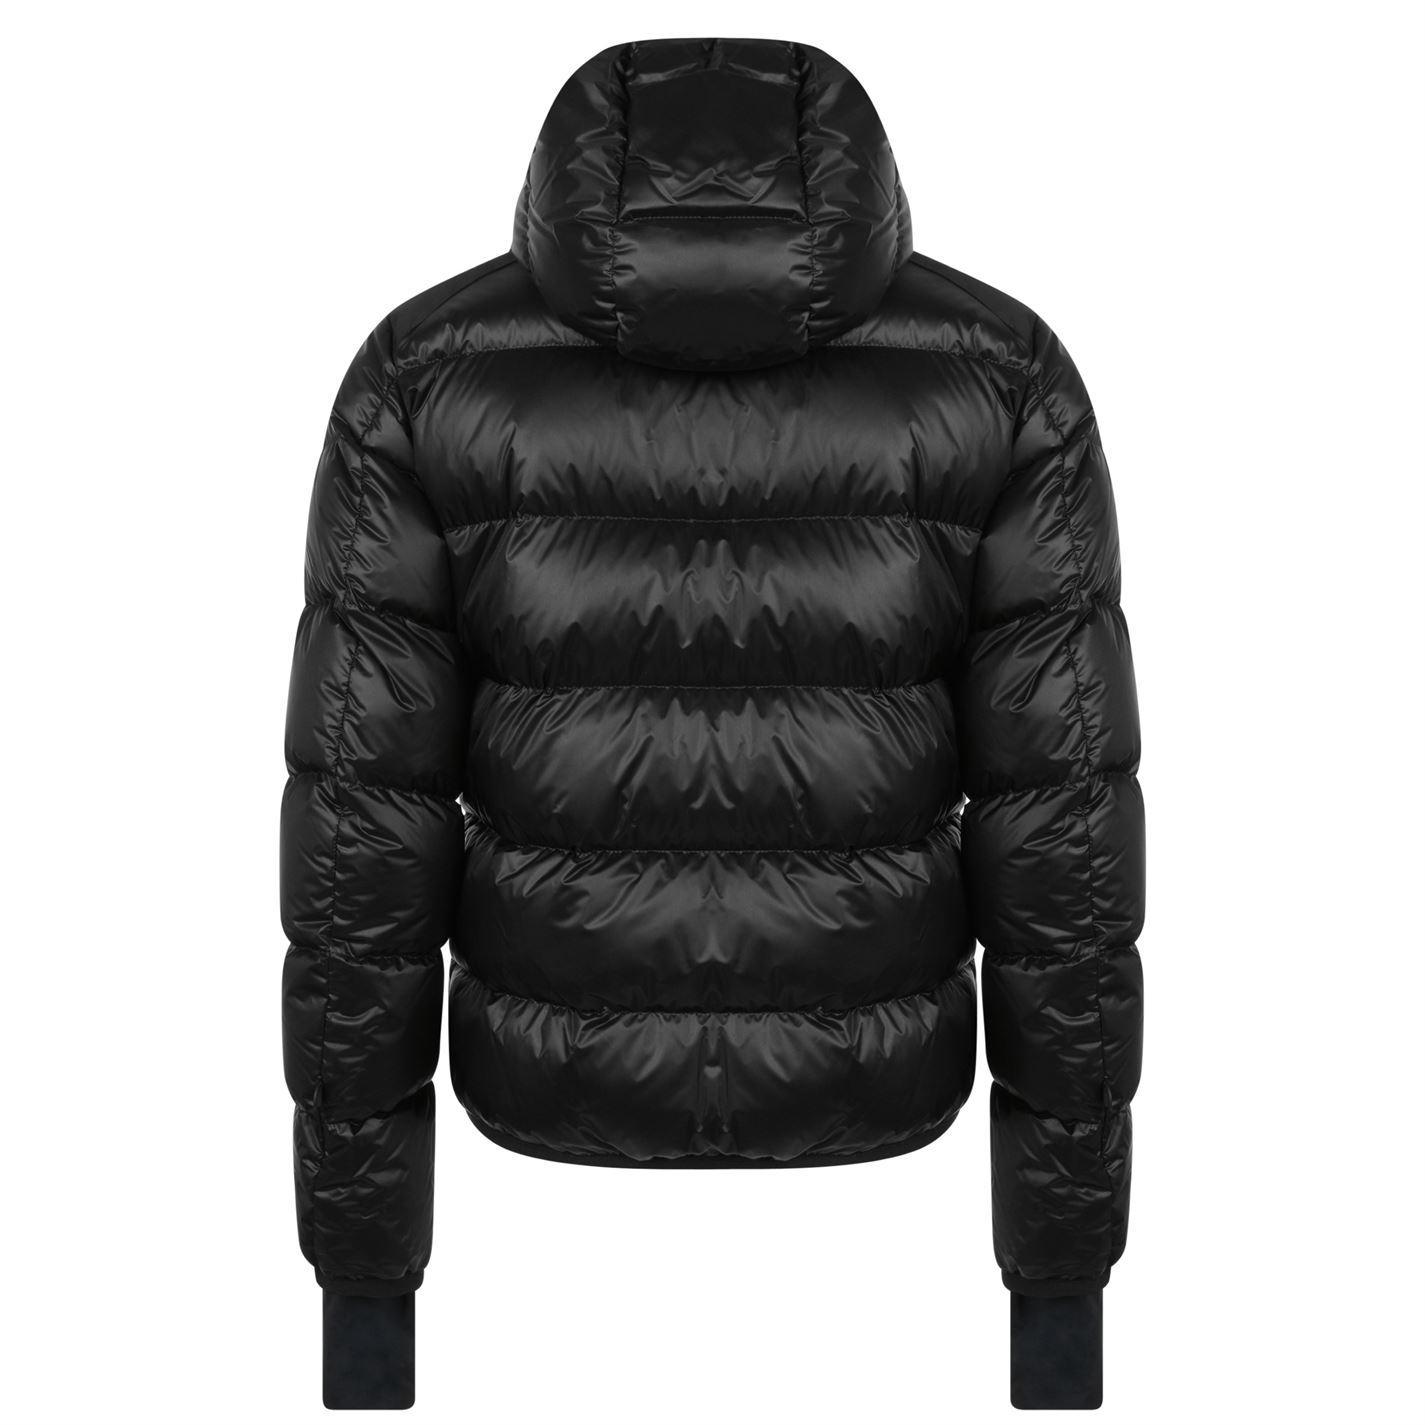 aa670c9955b28 Moncler Grenoble - Black Hintertux Padded Jacket for Men - Lyst. View  fullscreen